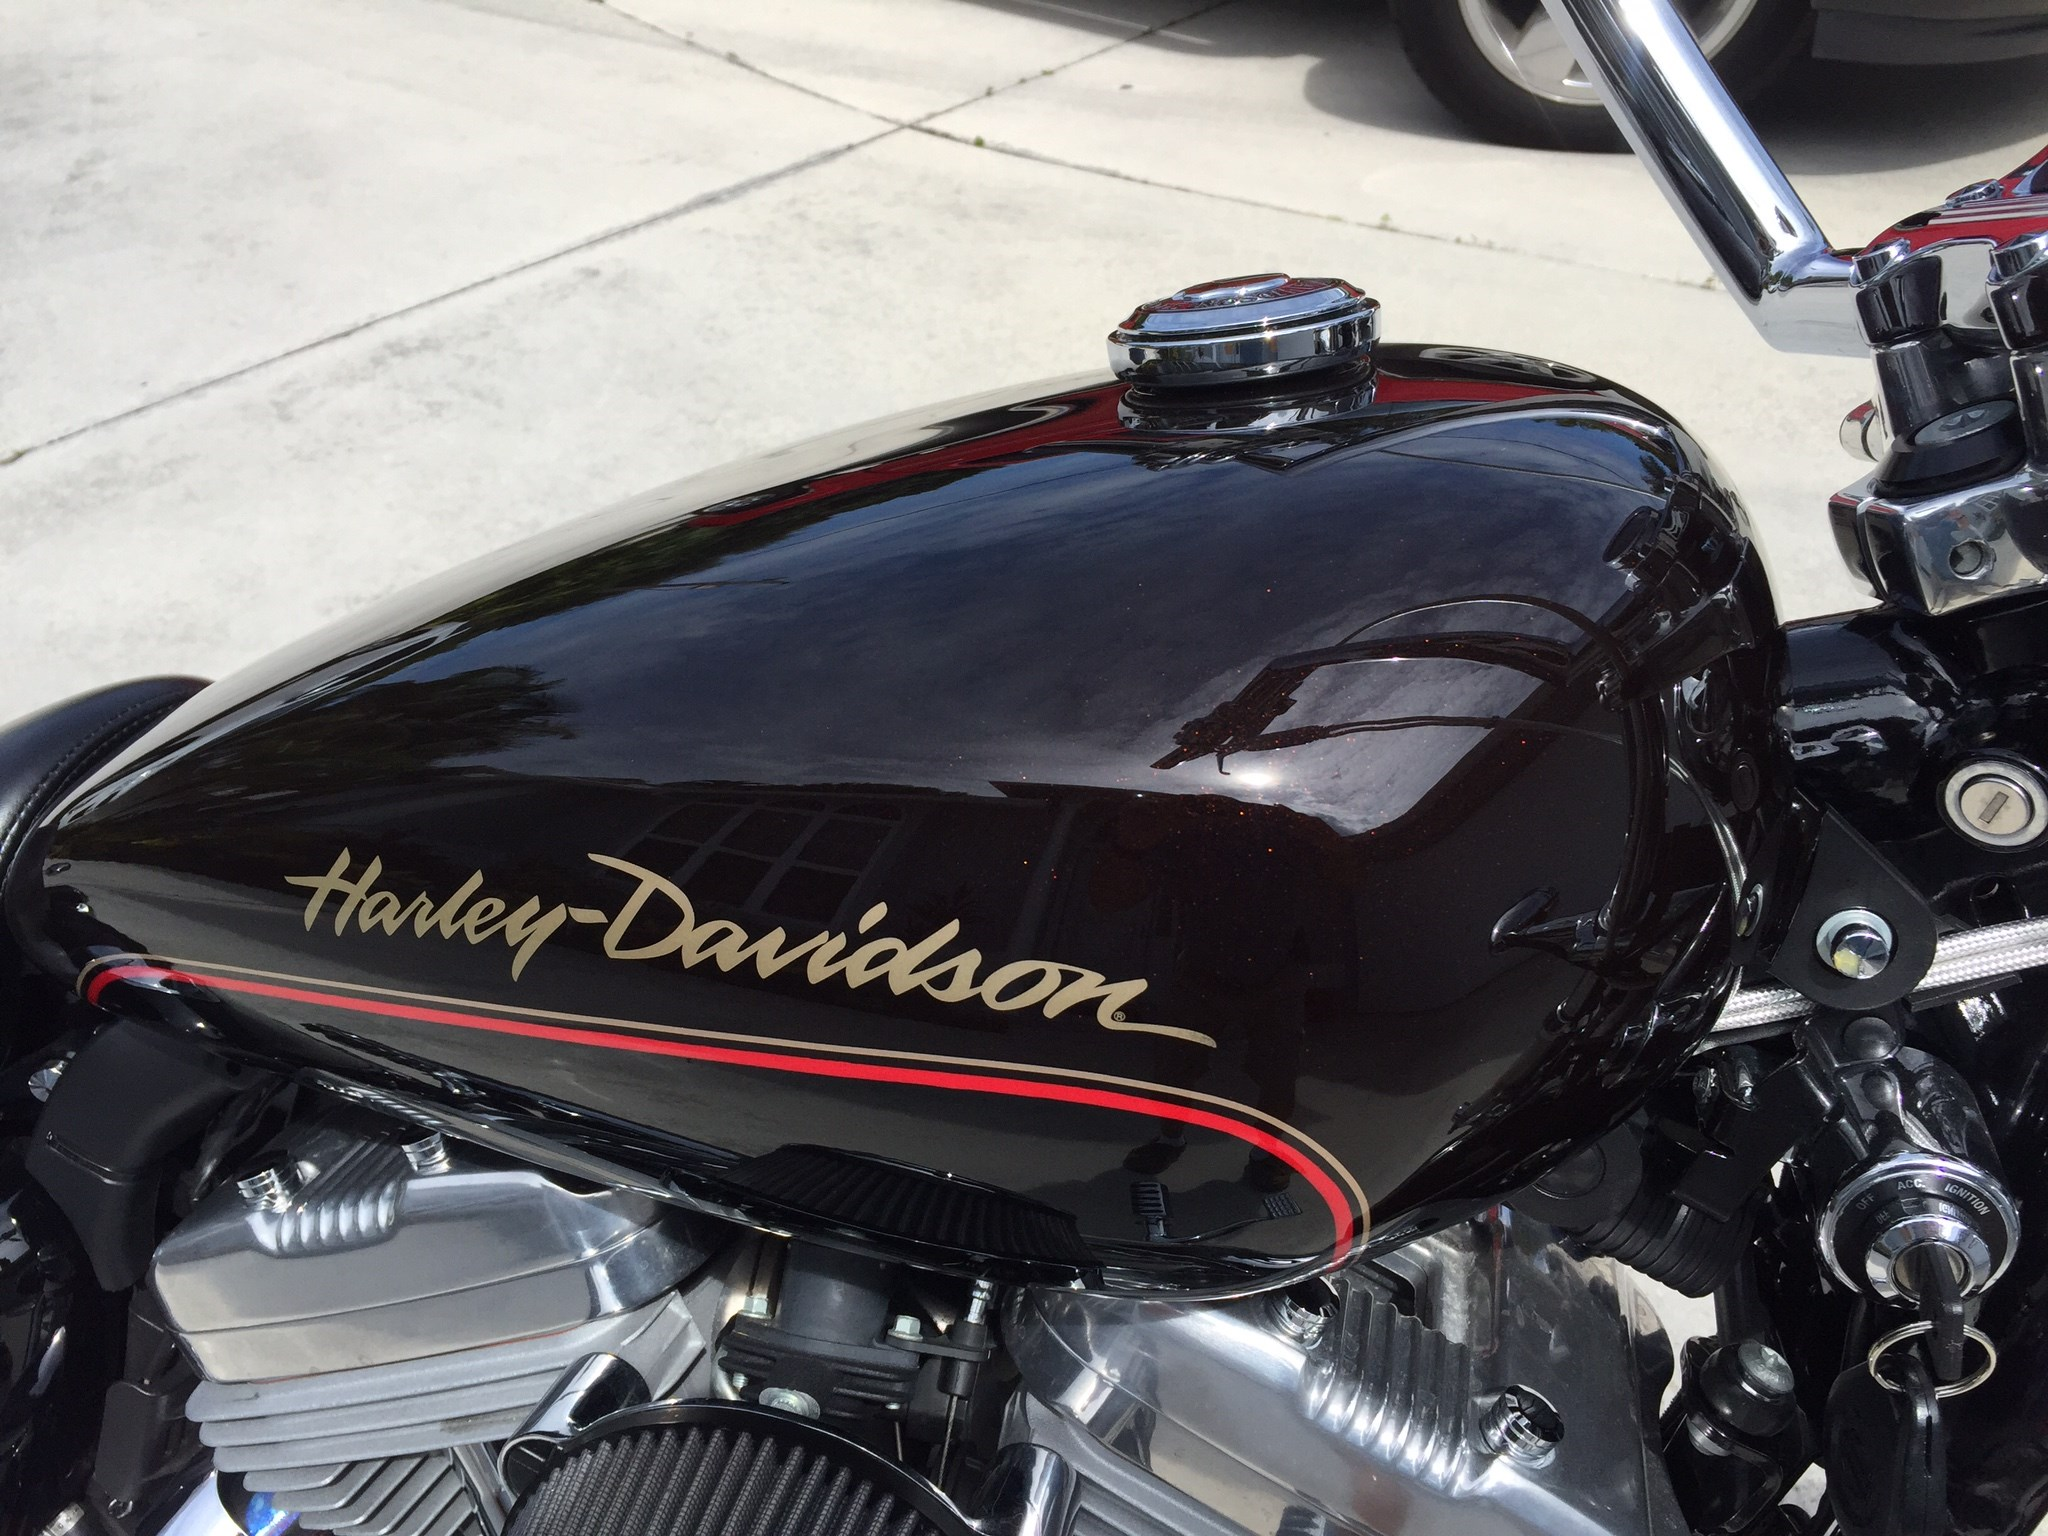 2011 Harley Davidson 174 Xl883l Sportster 174 883 Superlow